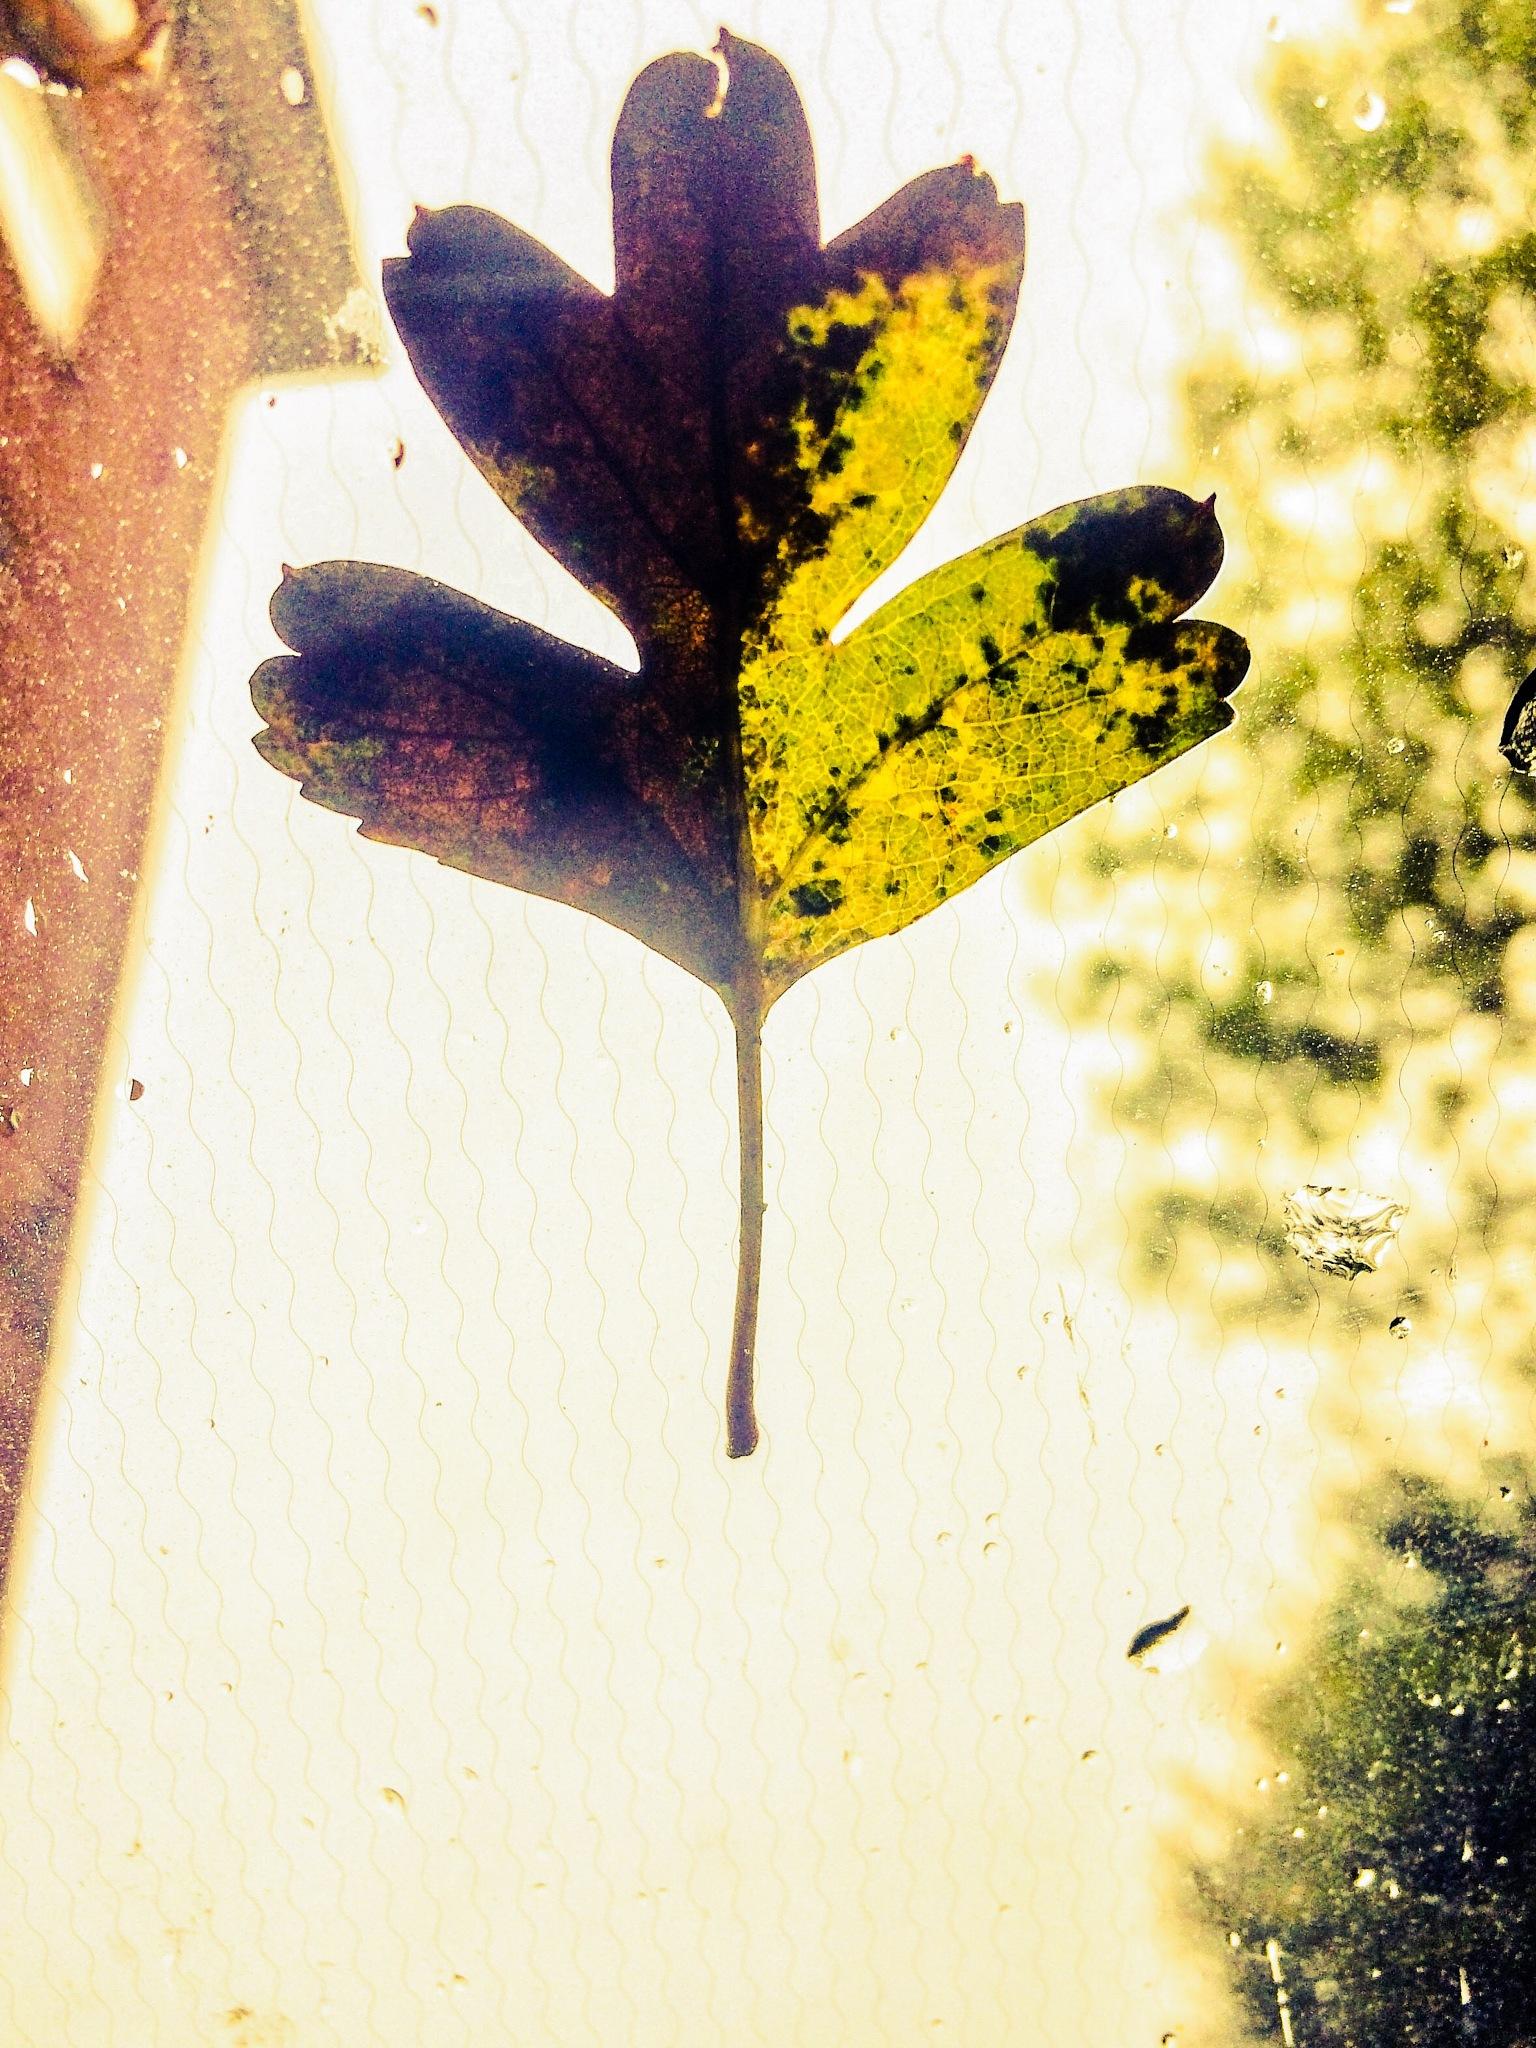 Leaf on the window by Tracey Glazebrook